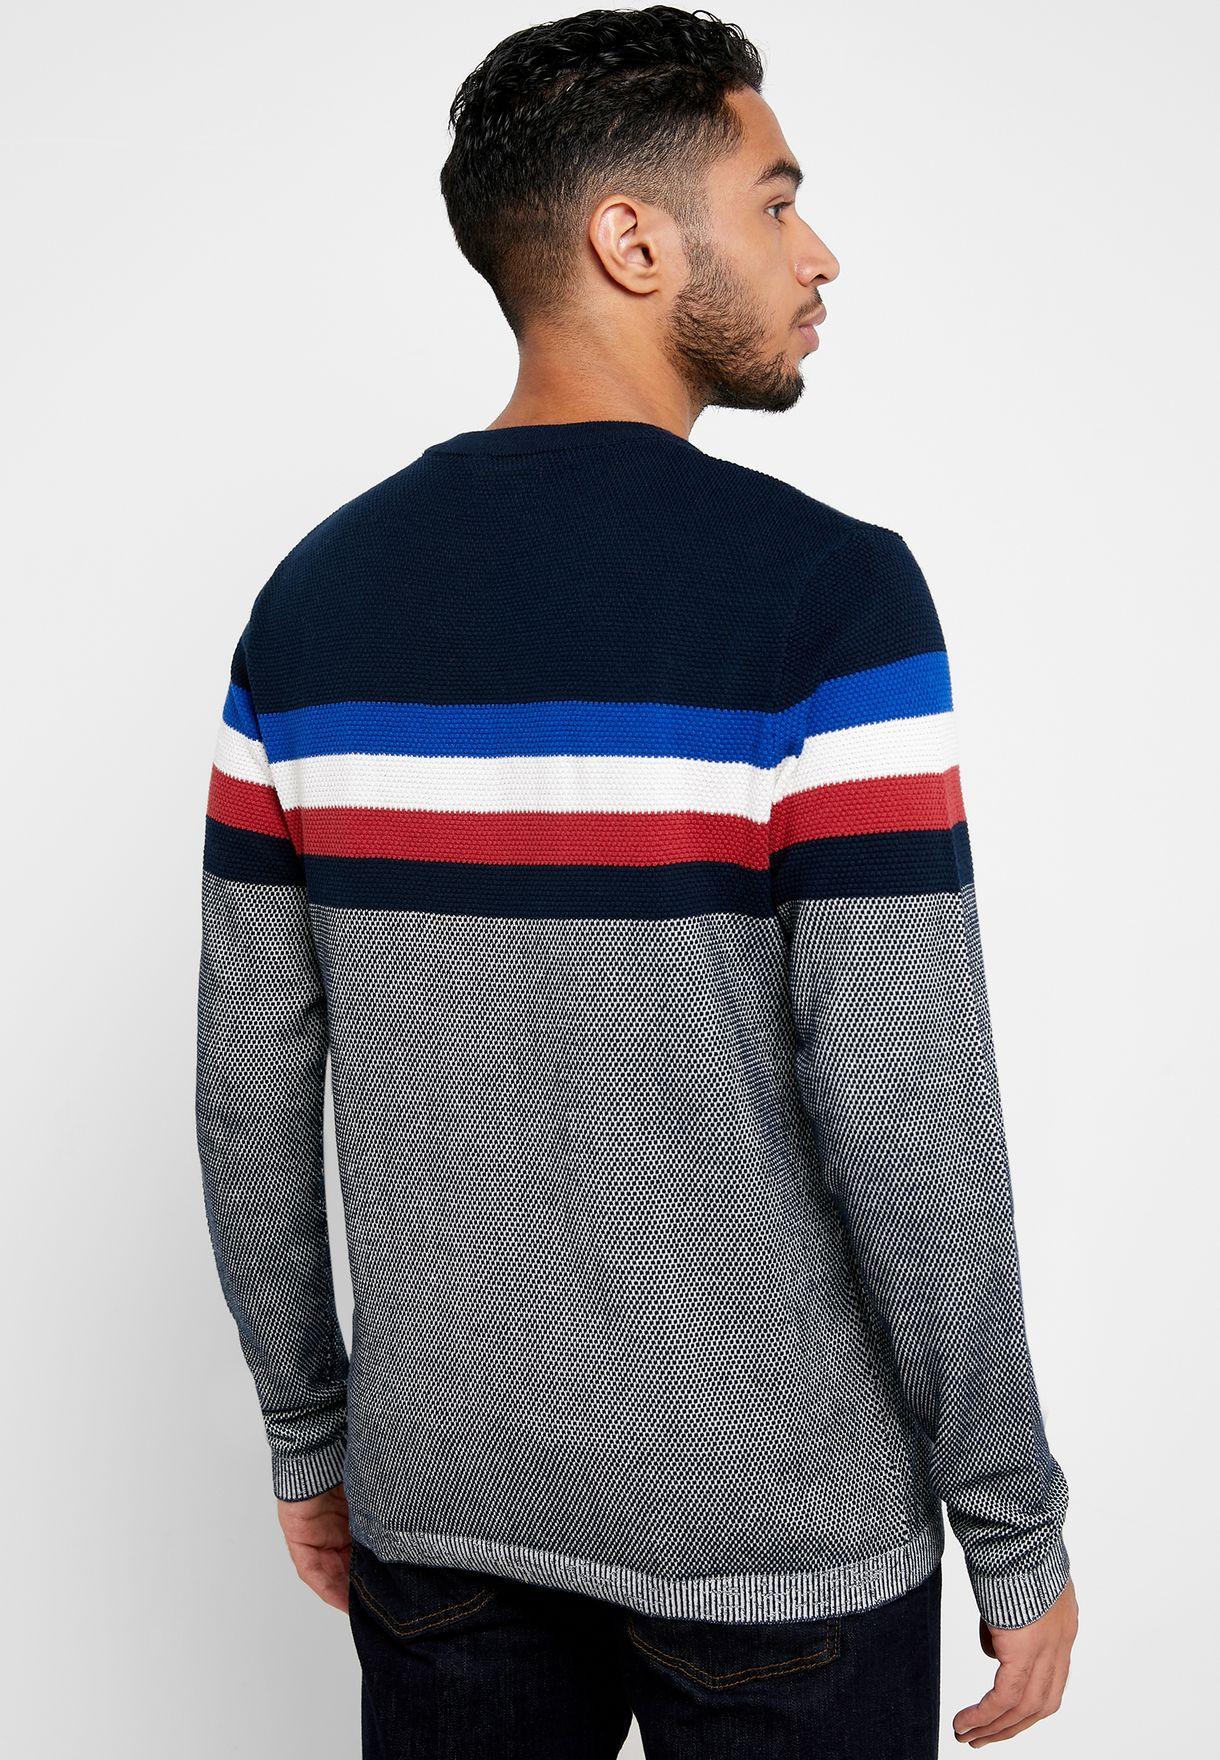 Larry Color Block Sweater